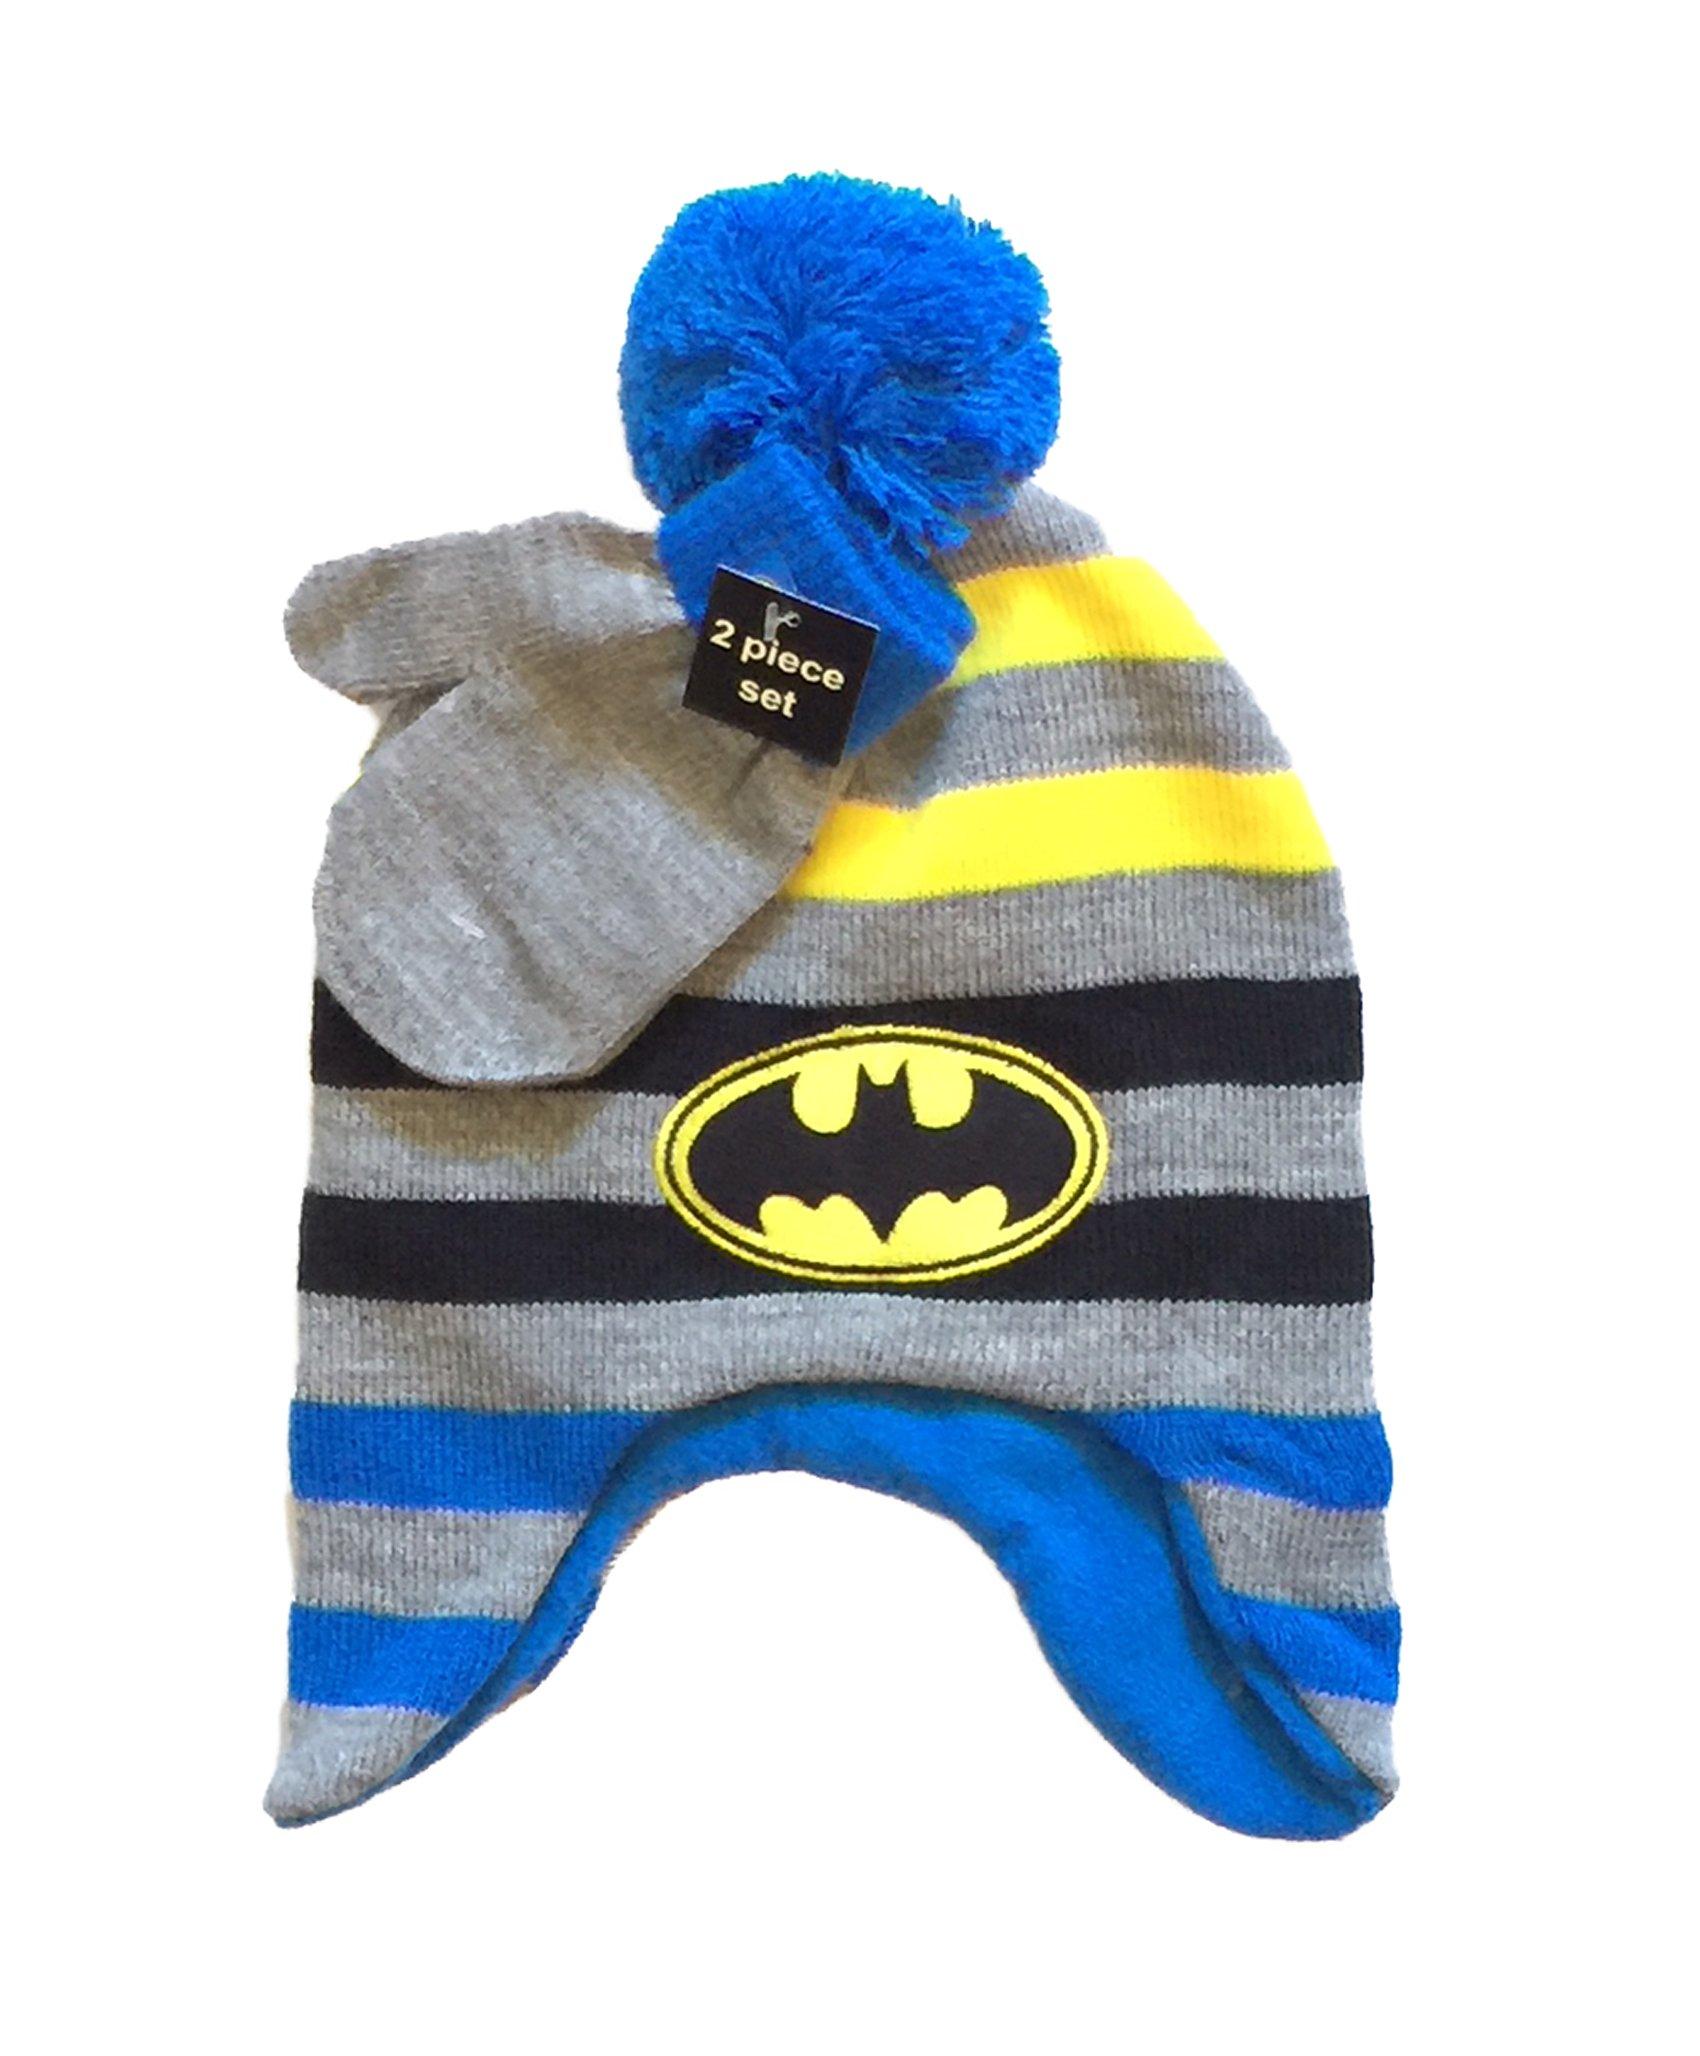 3172572c0b0 Get Quotations · DC Comics Batman Little Boys Beanie Hat   Mitten Set